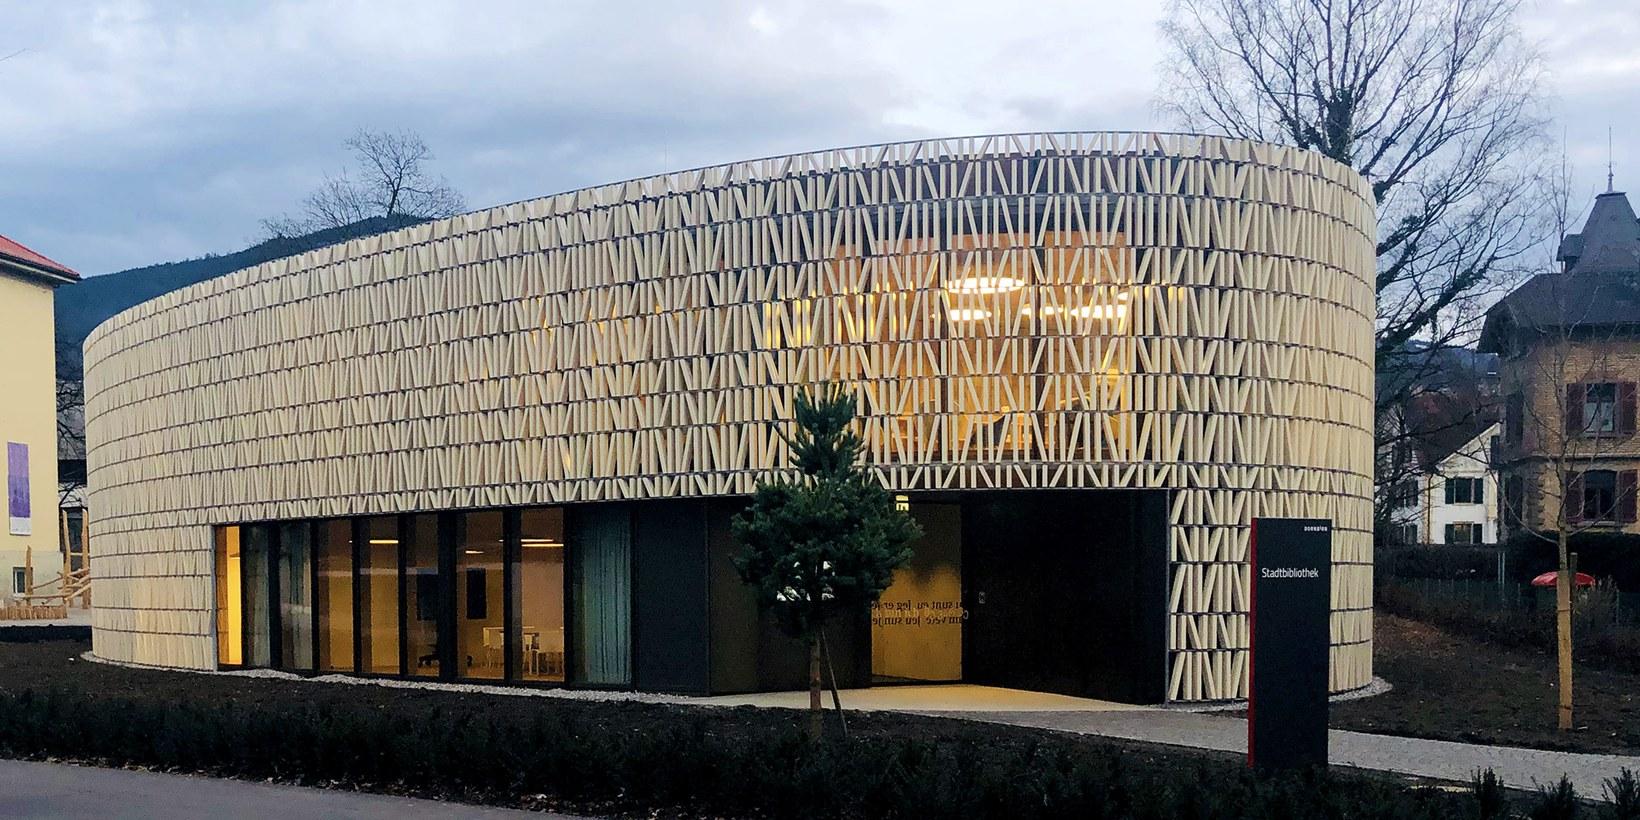 Dornbirner-Stadtbibliothek.jpg